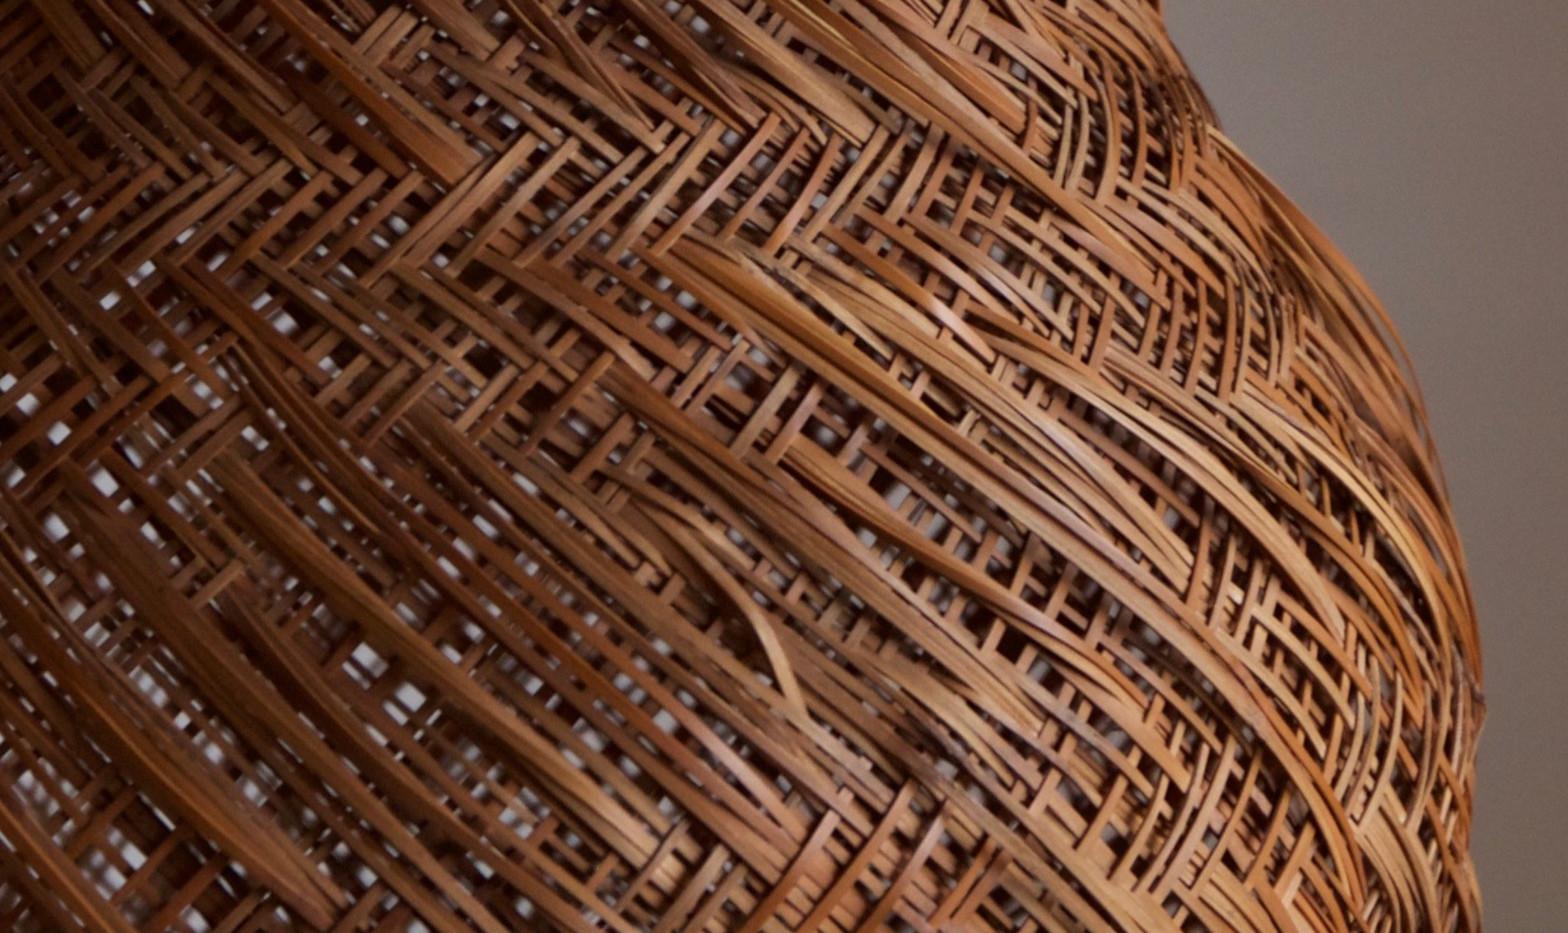 Iizuka Hosai II bamboo flower basket titled Imo/Potato 02.jpg